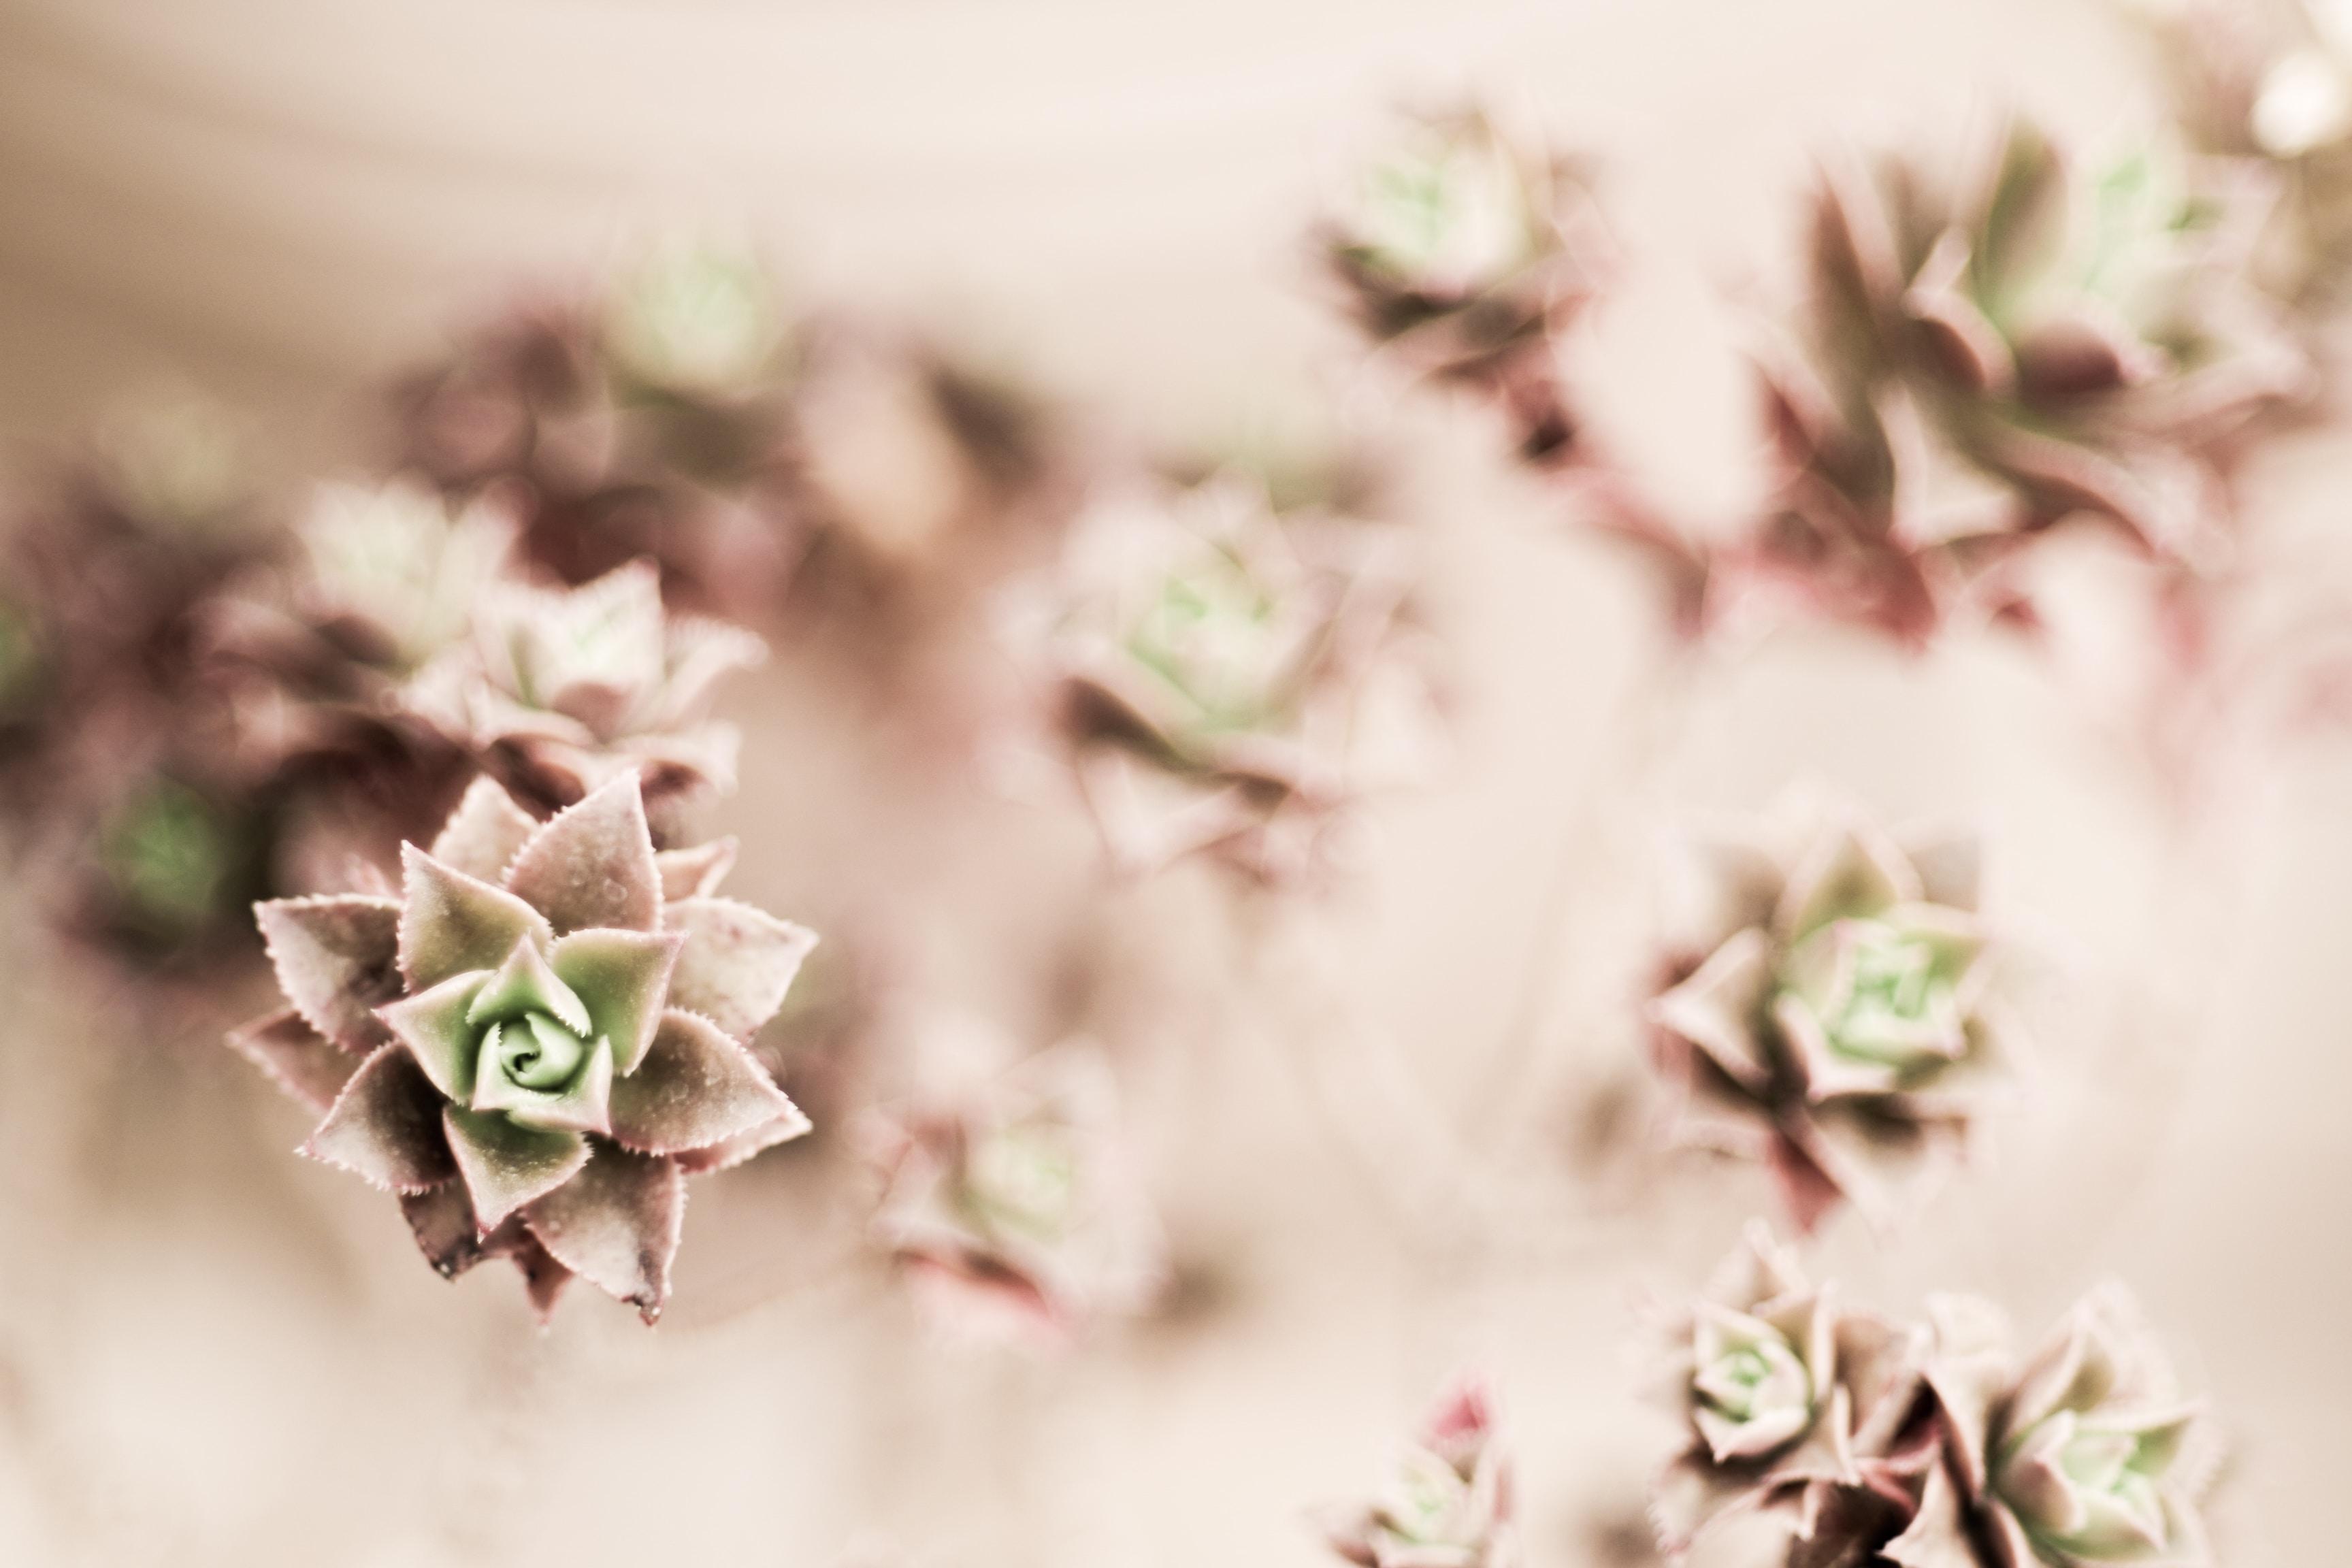 selective focus close-up photo flowers